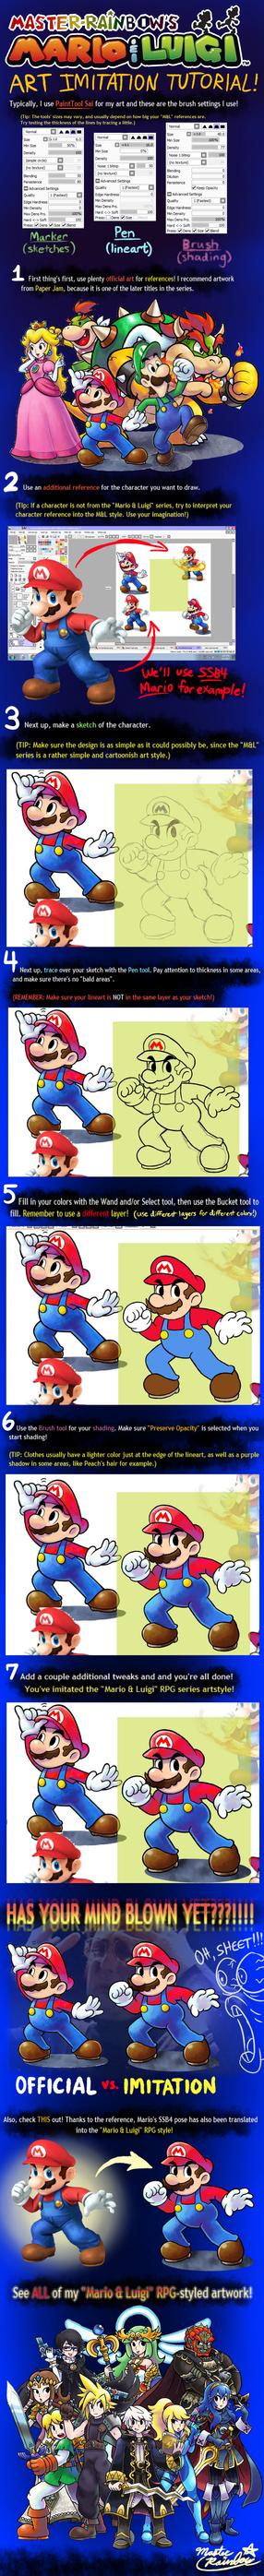 'Mario+Luigi' RPG ART IMITATION TUTORIAL by Master-Rainbow